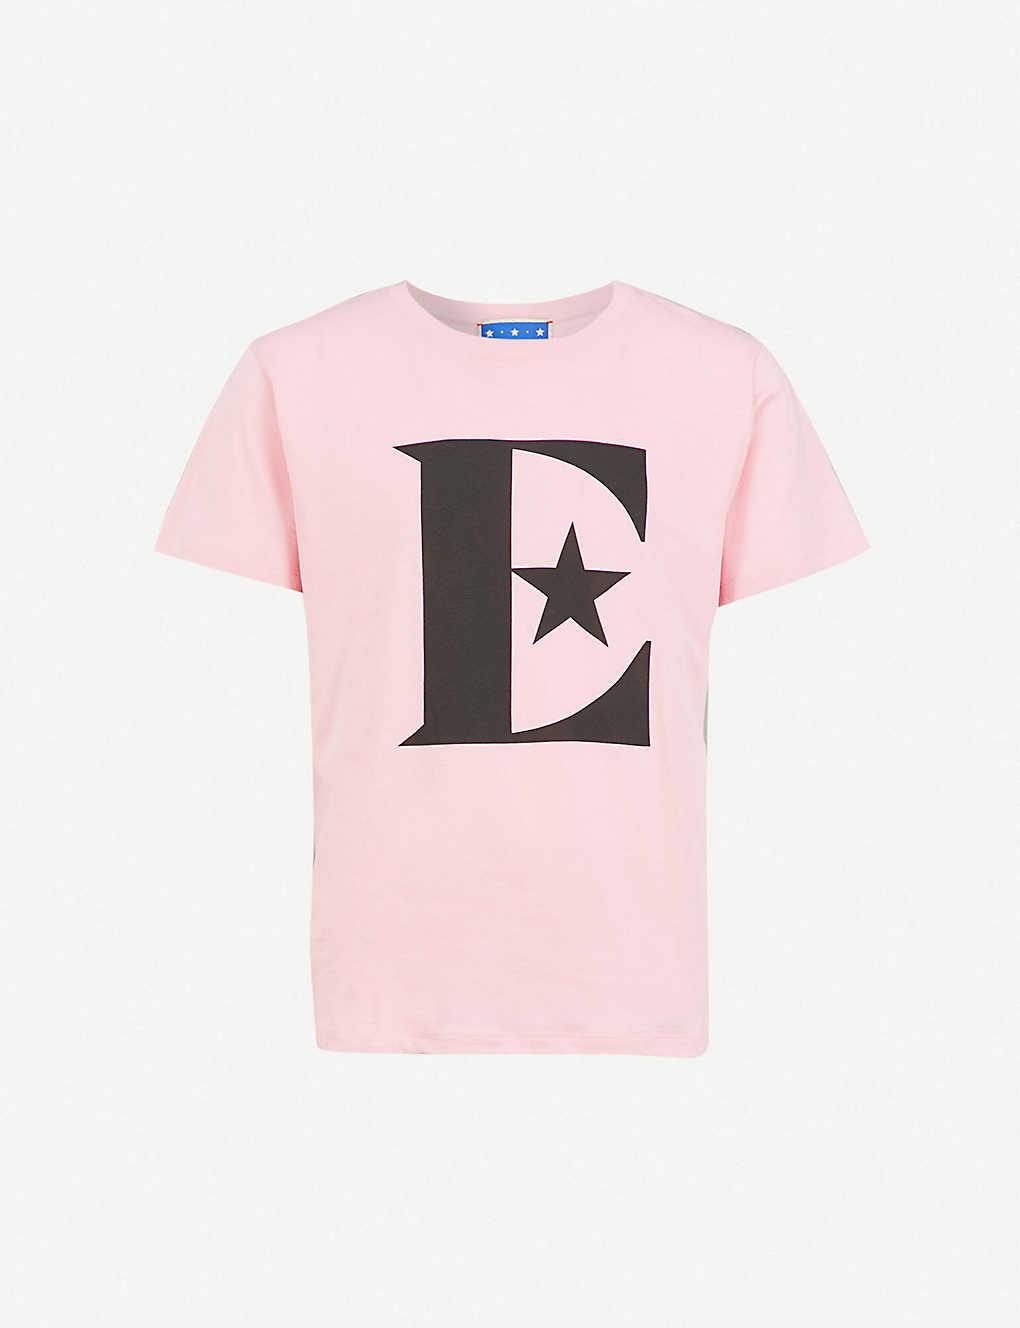 dbb69b1b87a1 GUCCI - Elton John cotton T-shirt | Selfridges.com